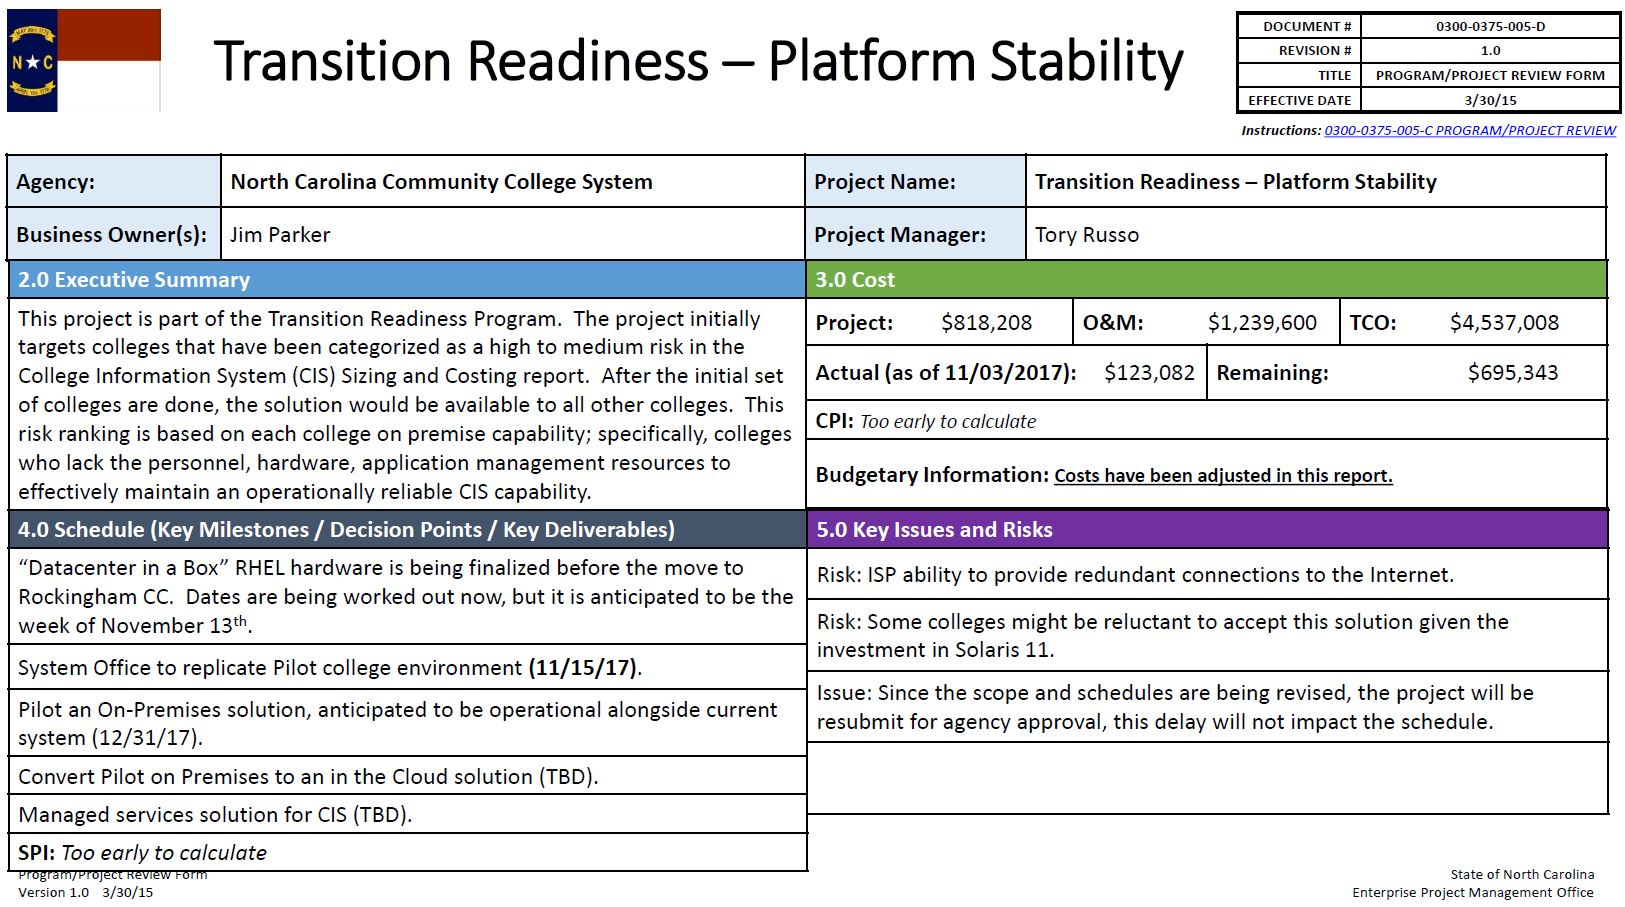 Transition Readiness - Platform Stability Project progress update